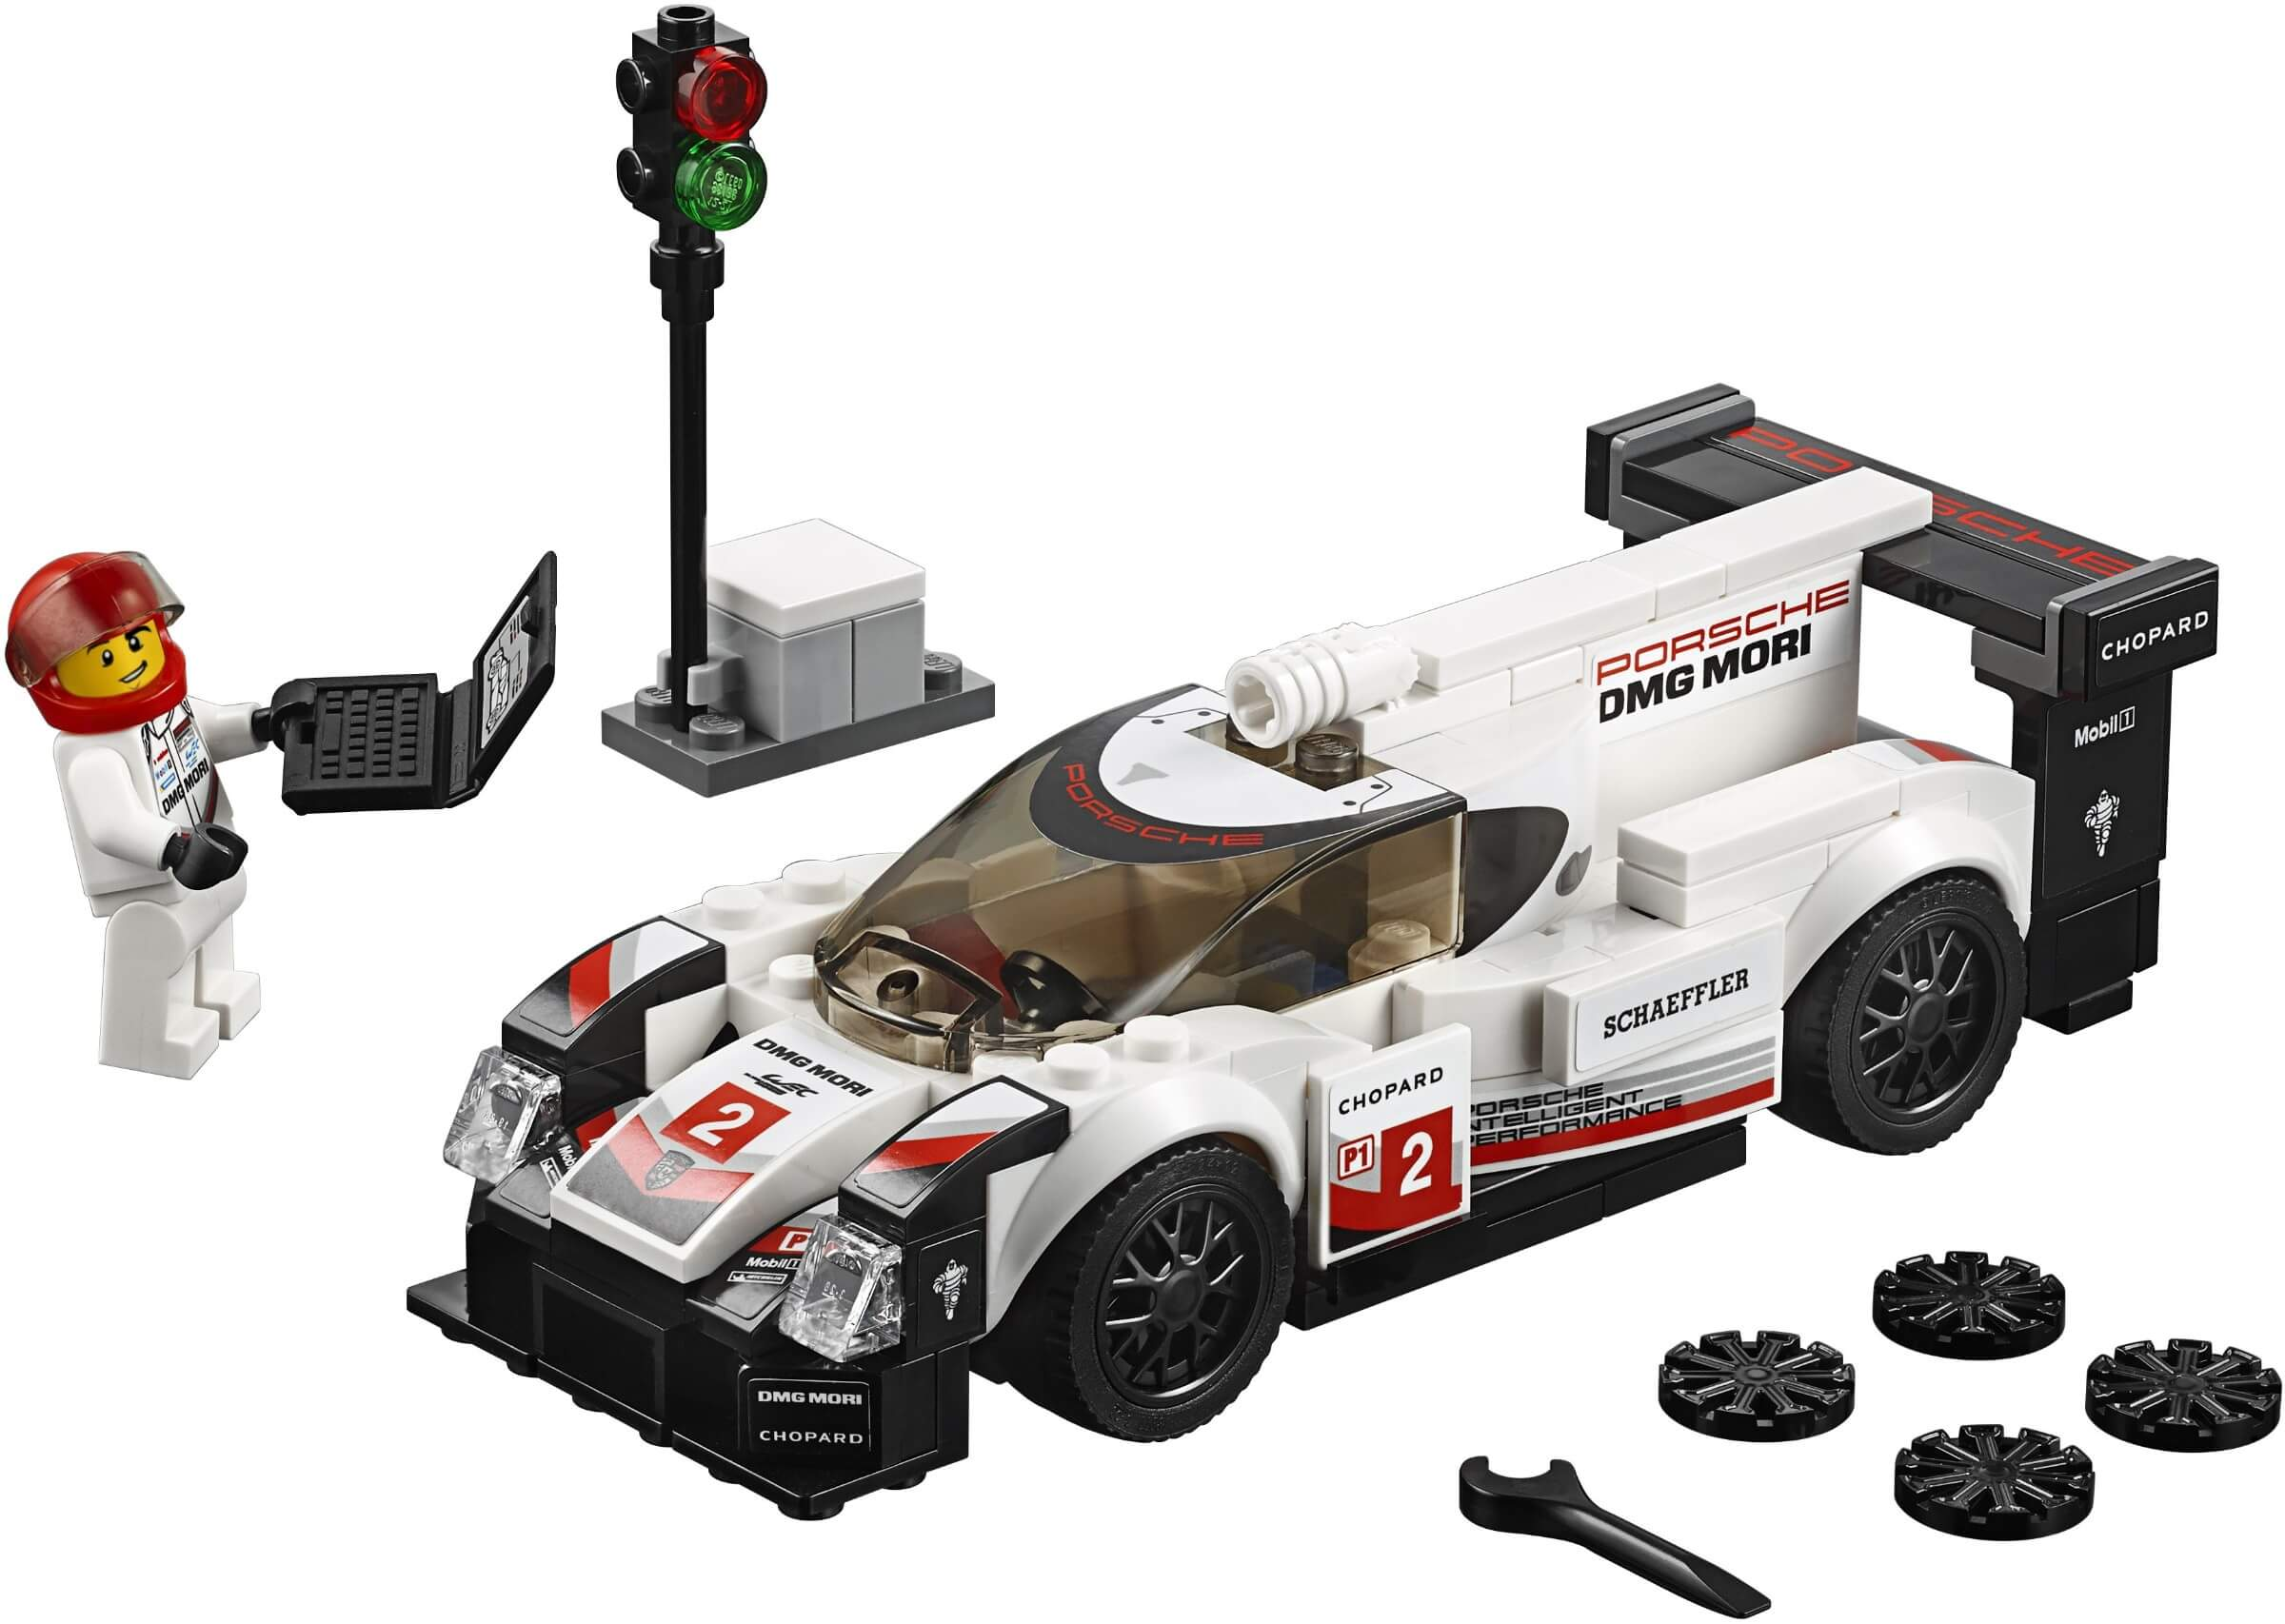 Mua đồ chơi LEGO 75887 - LEGO Speed Champion 75887 - Siêu Xe Porsche 919 Hybrid (LEGO Speed Champion 75887 Porsche 919 Hybrid)